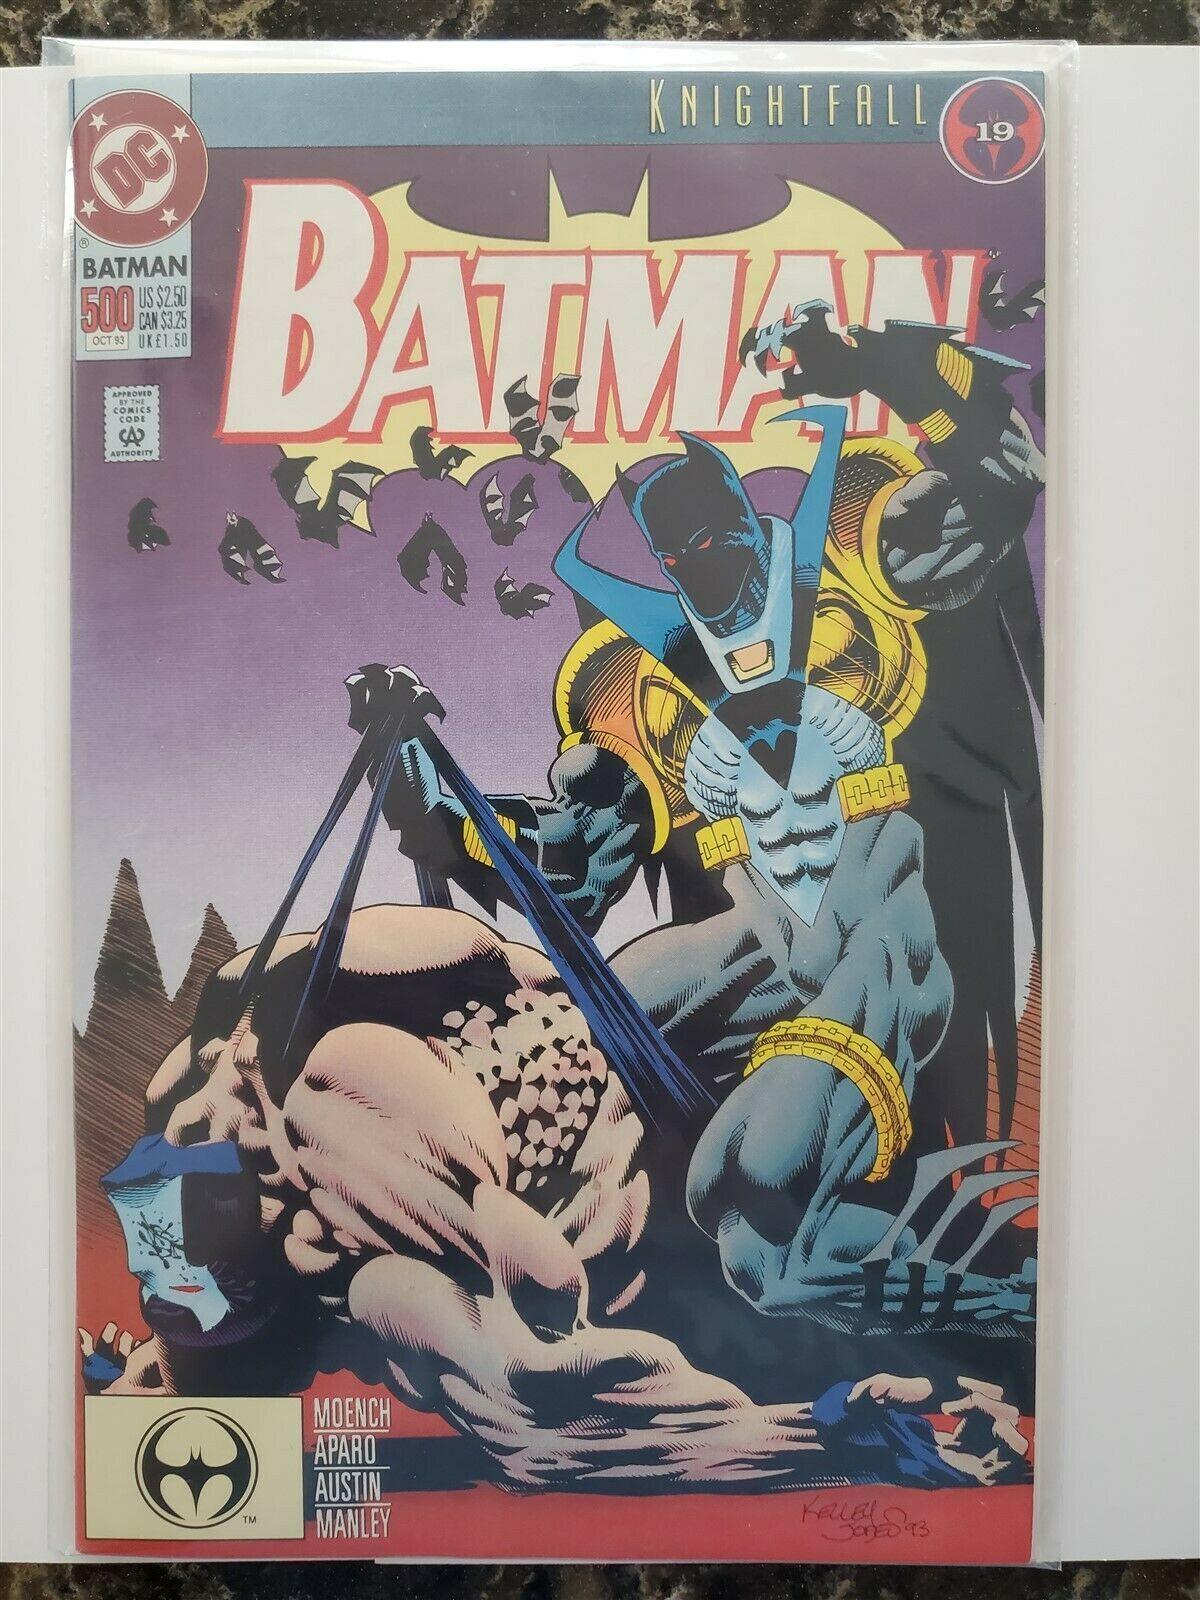 Batman 15 Knightfall 15 DC 15 VF+ / HipComic